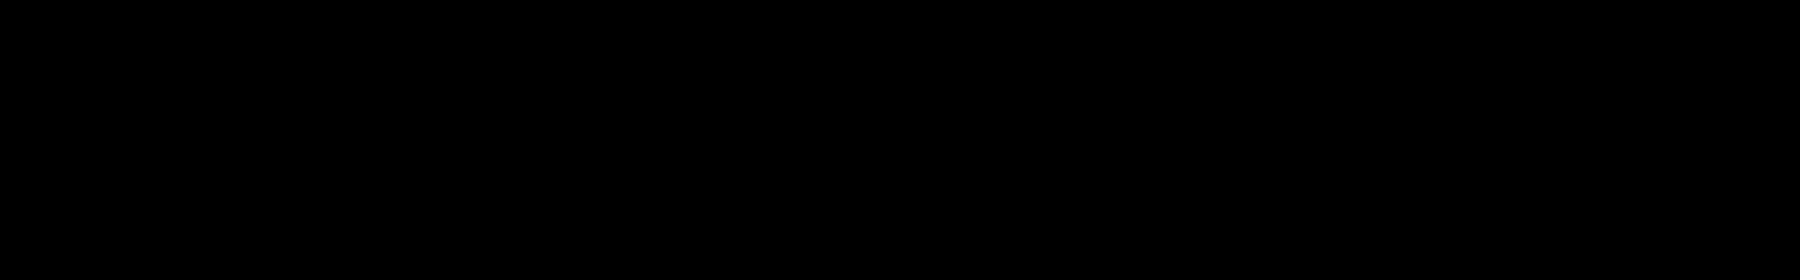 Signal Interference audio waveform